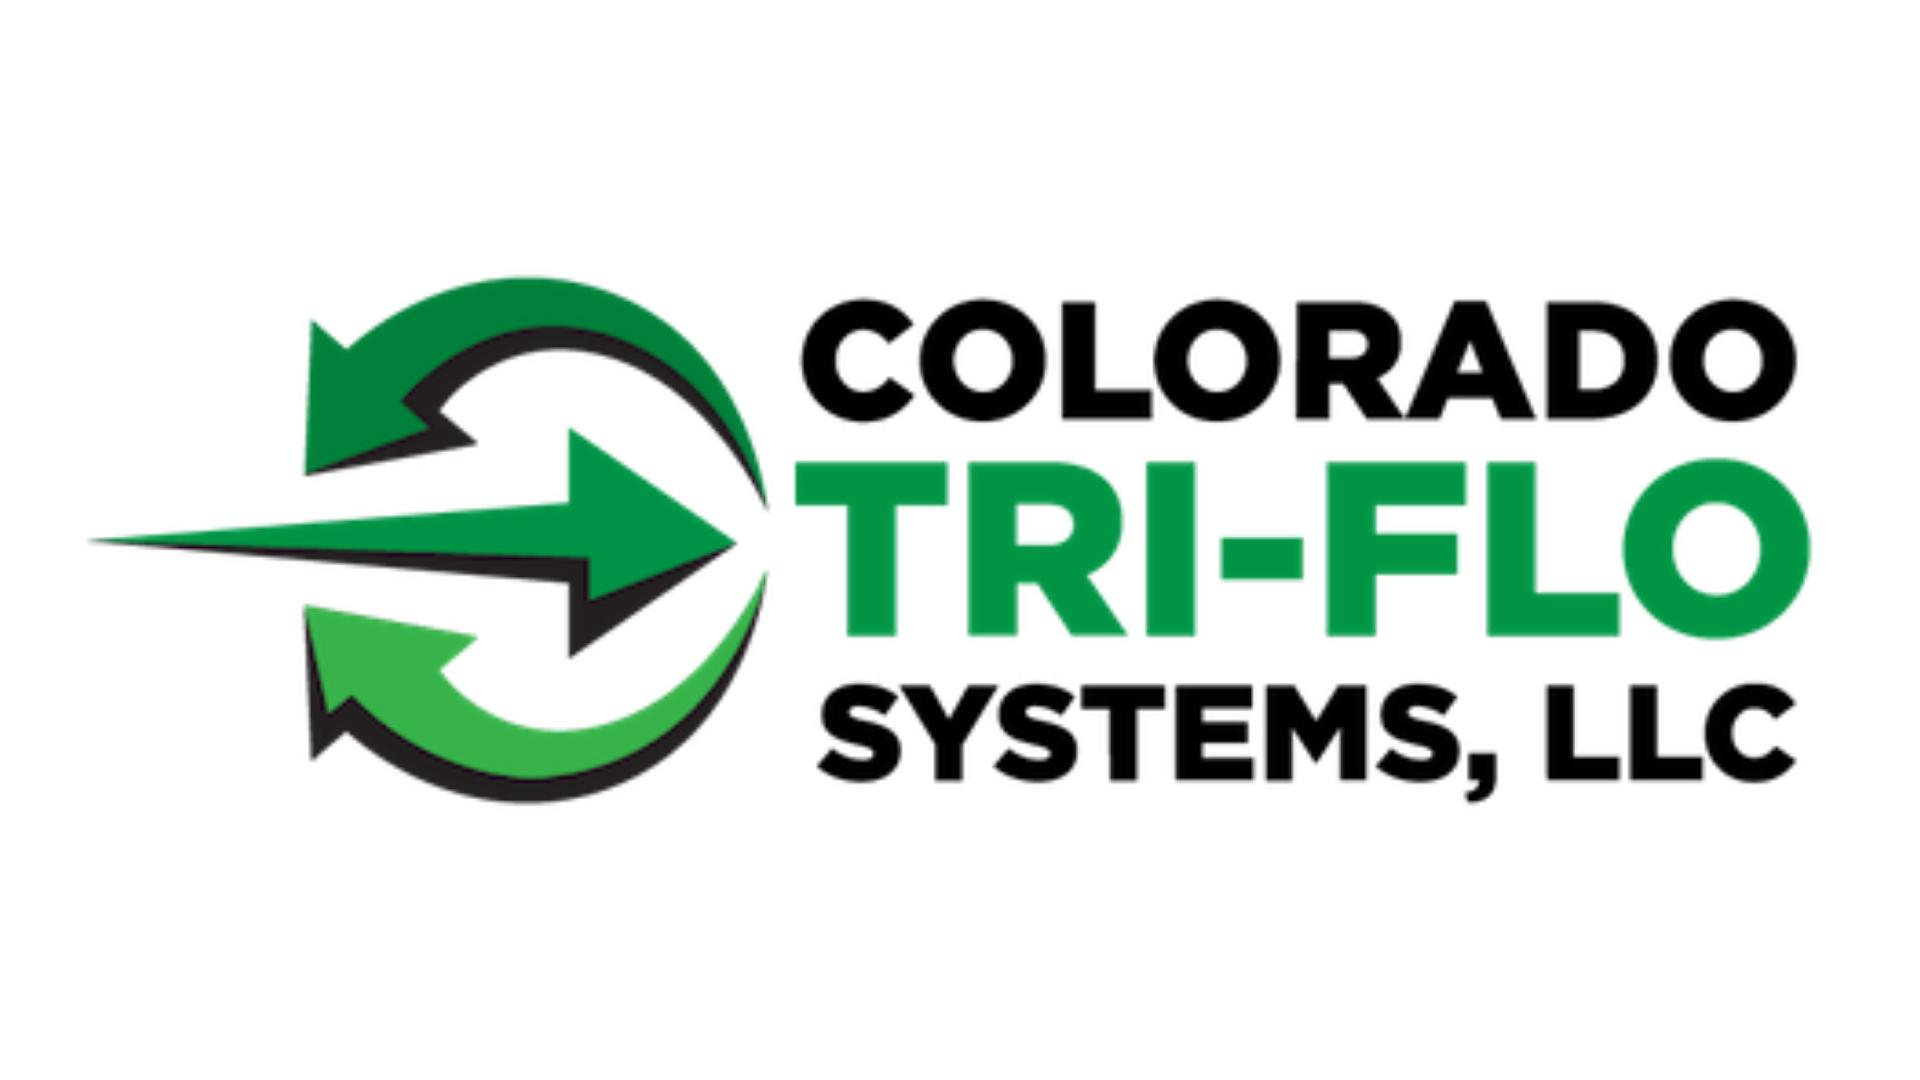 Colorado Tri-Flo partners with Spotta Smart Pest Systems